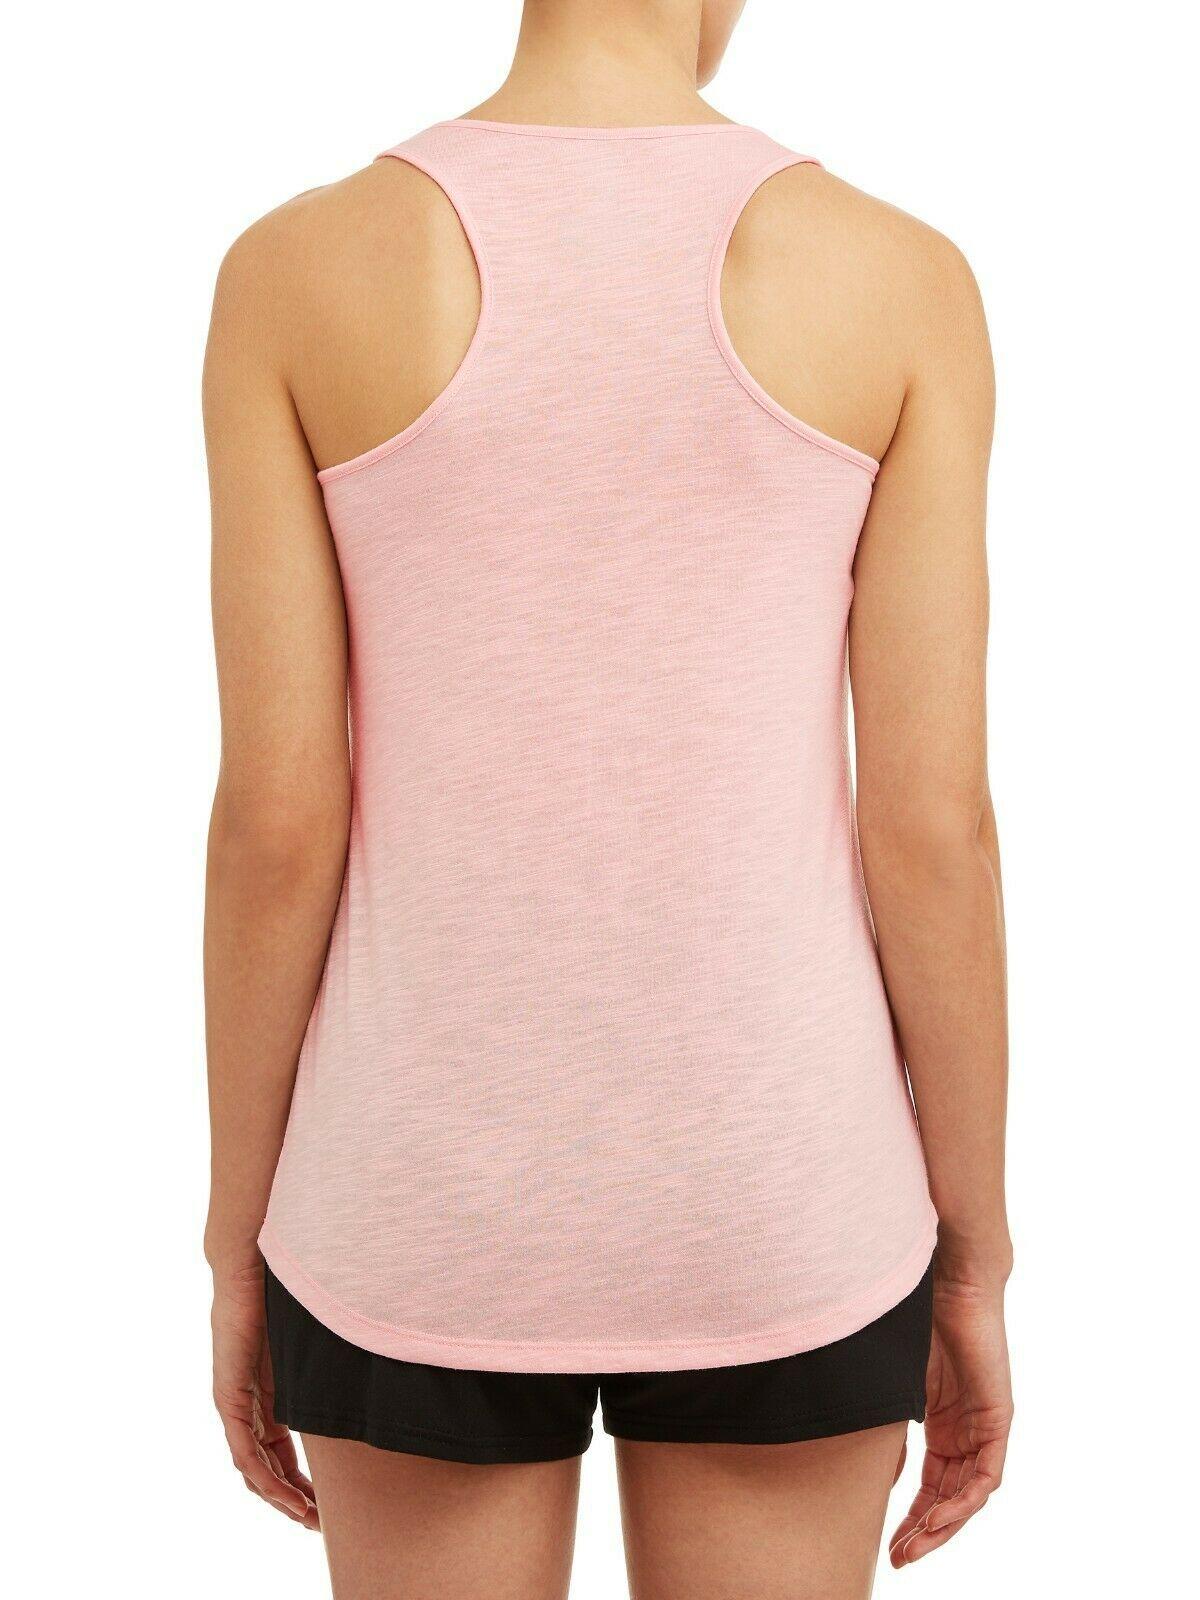 NEW Womens Sleep Shirt Pajamas Plus Size XL 16-18 Tank Top PJs Love Naps